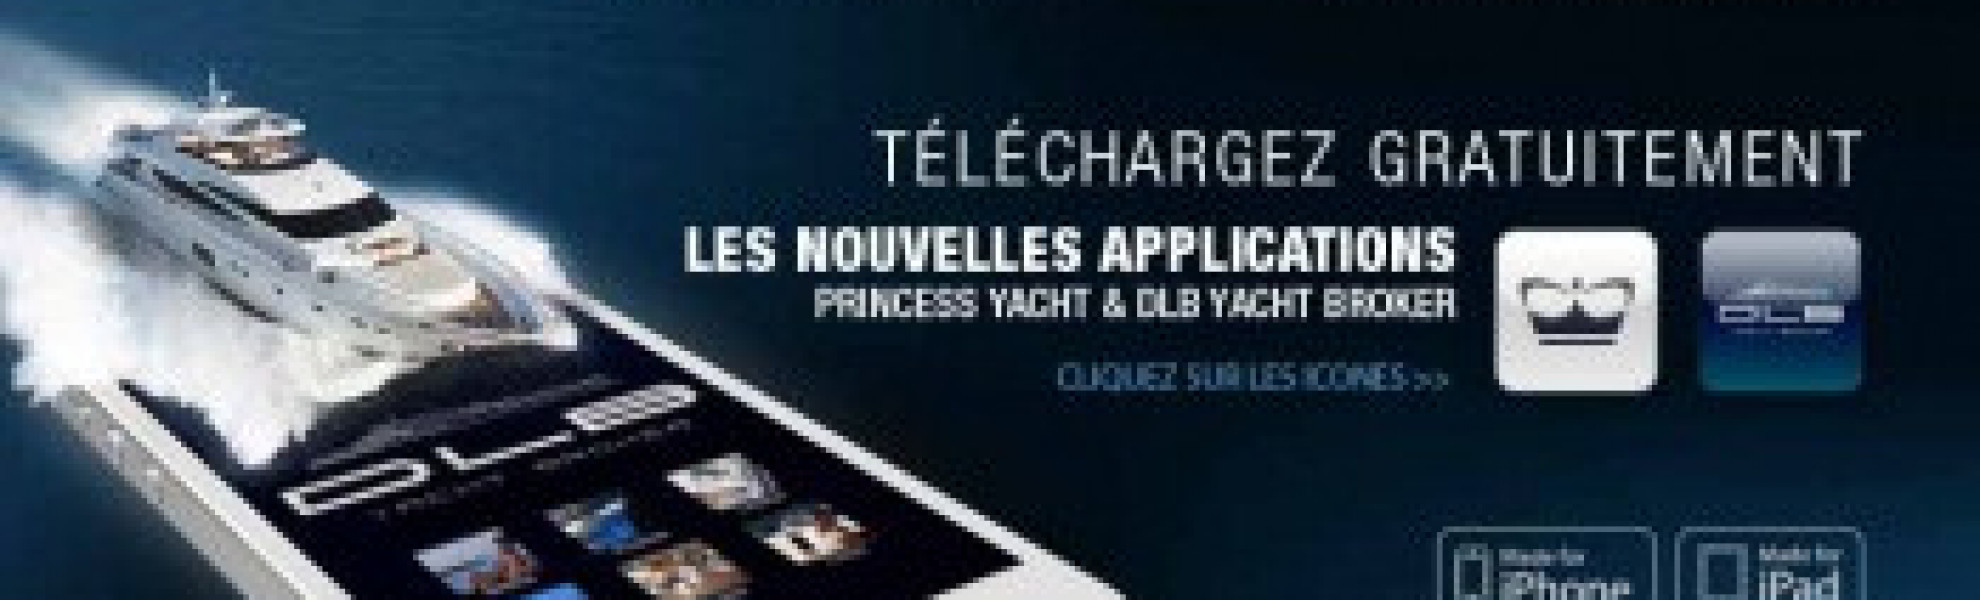 Application iPhone - DLB Yacht Broker - Princess